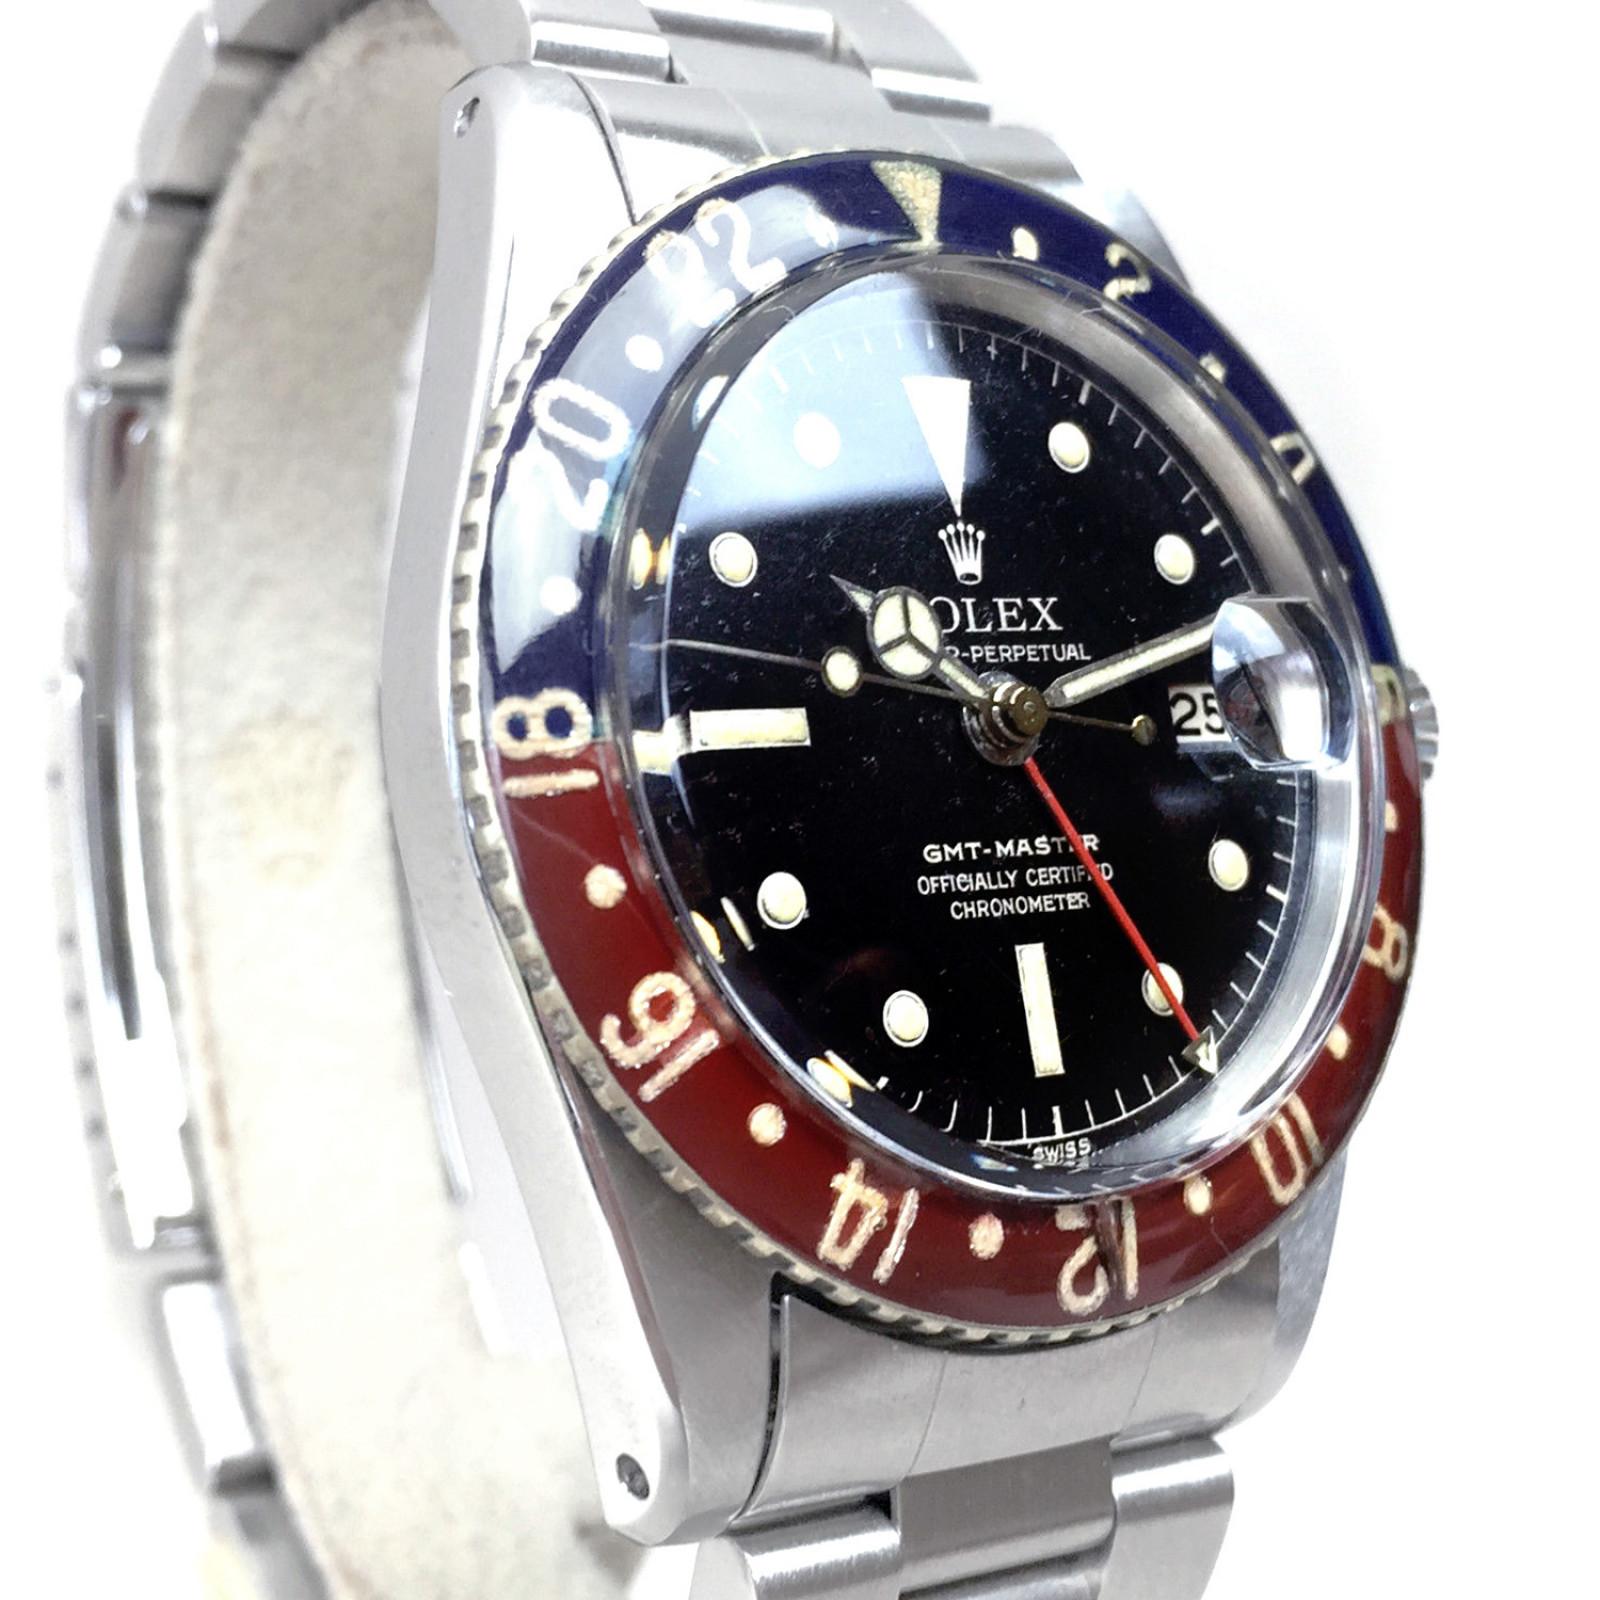 Vintage Rolex 6542 40 mm Steel on Oyster, Black & Red Ceramic, Coke Style Bezel